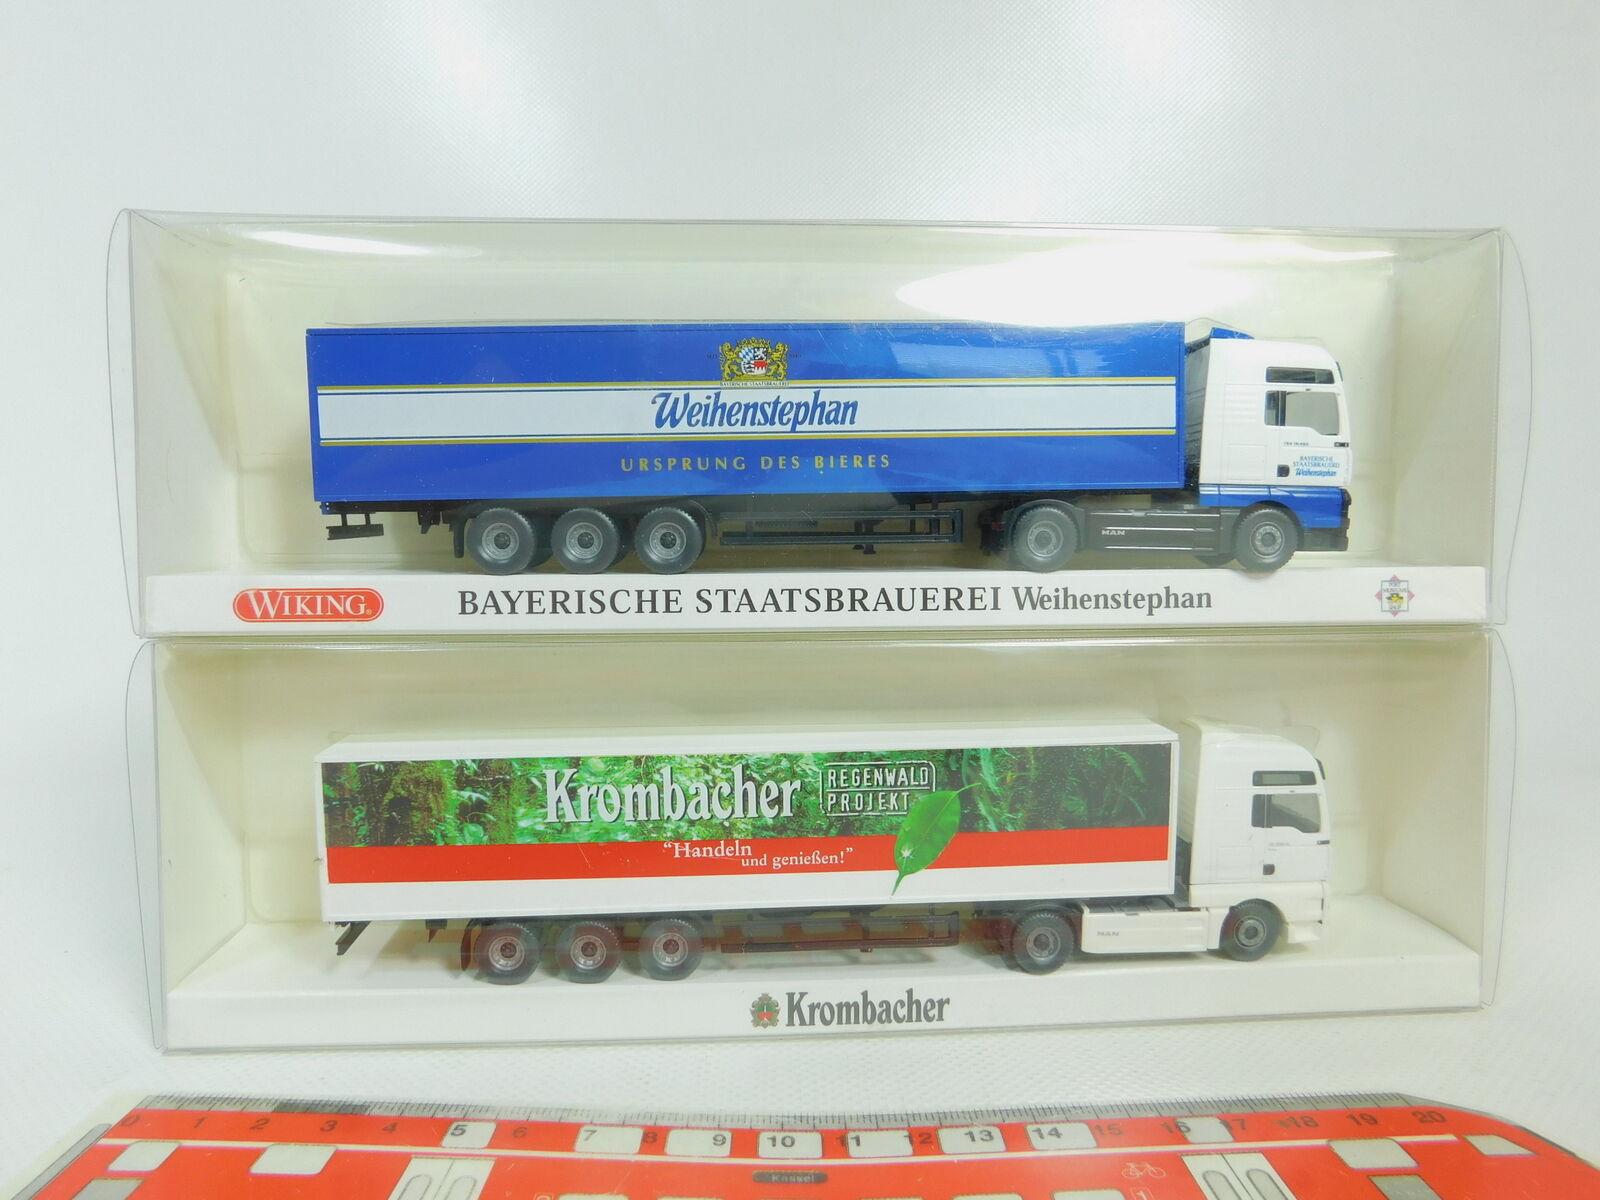 BO632-0,5x Wiking H0 1 87 87 87 Sattelzug MAN  82-15 Weihenstephan + 2634, NEUW+OVP 24e22a